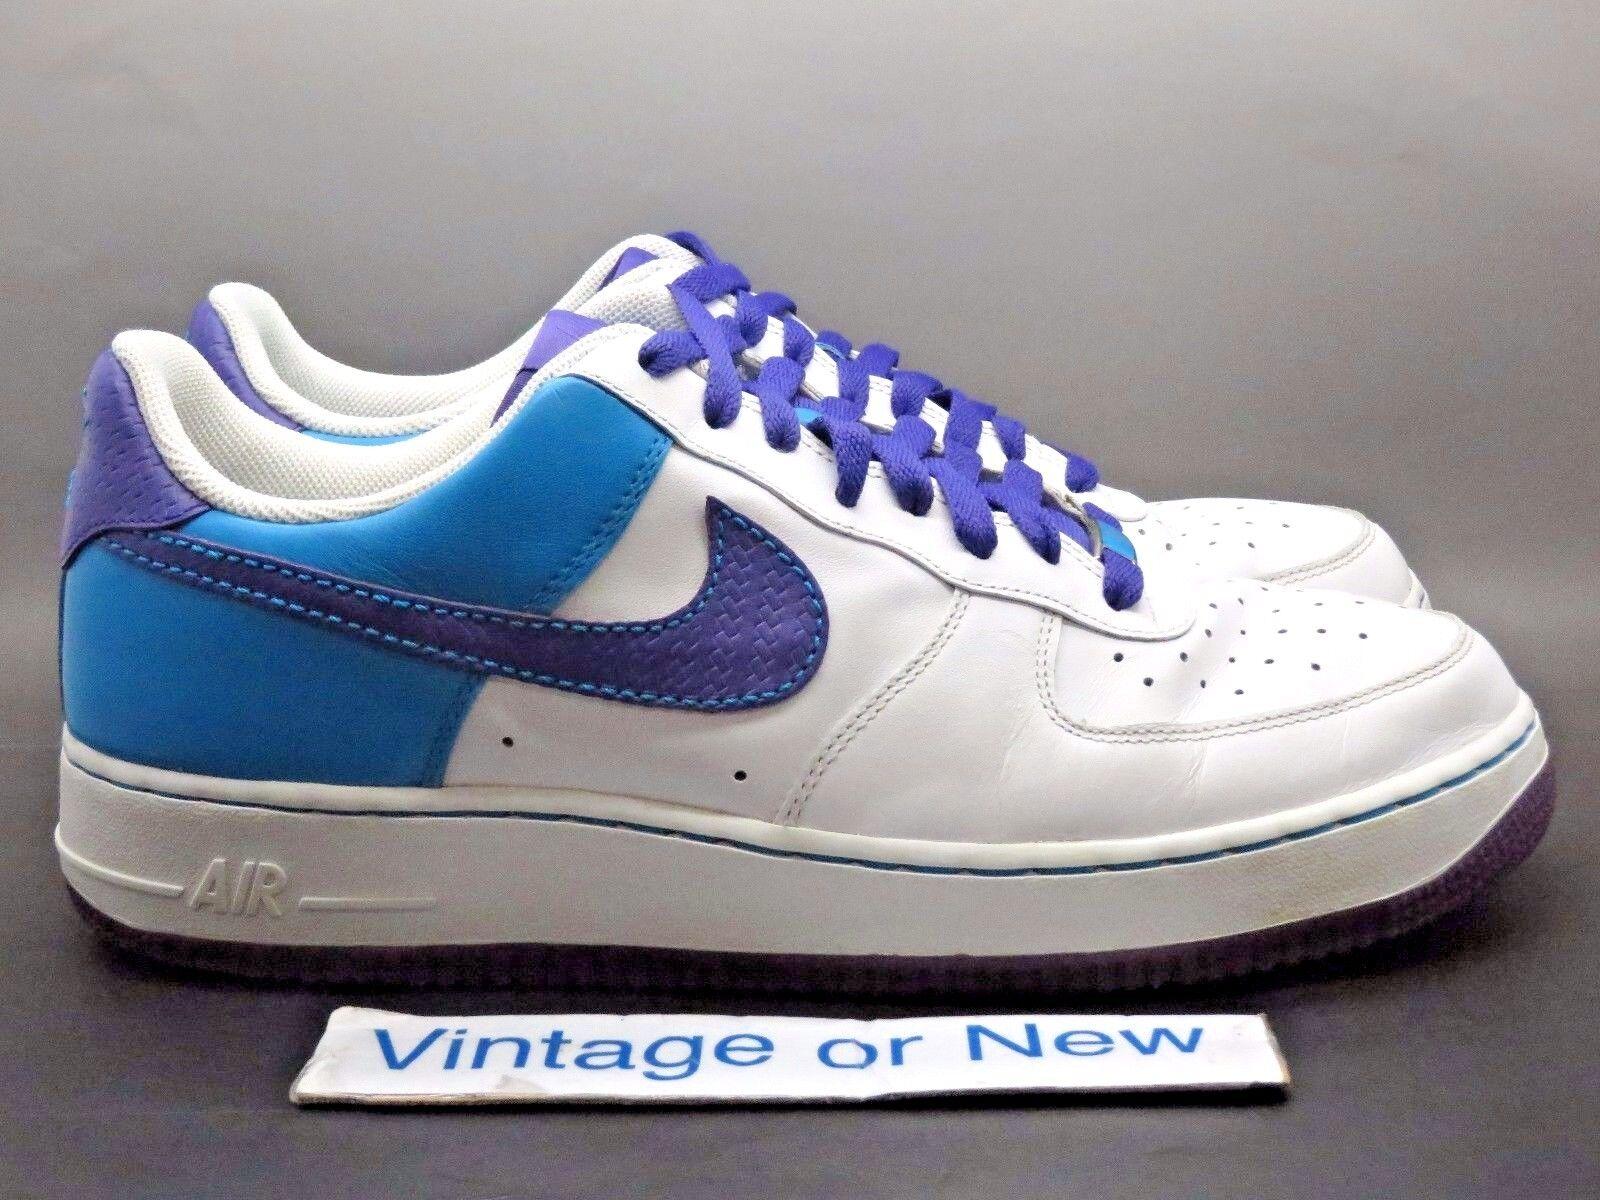 Nike Air Force Blu 1 Bassa